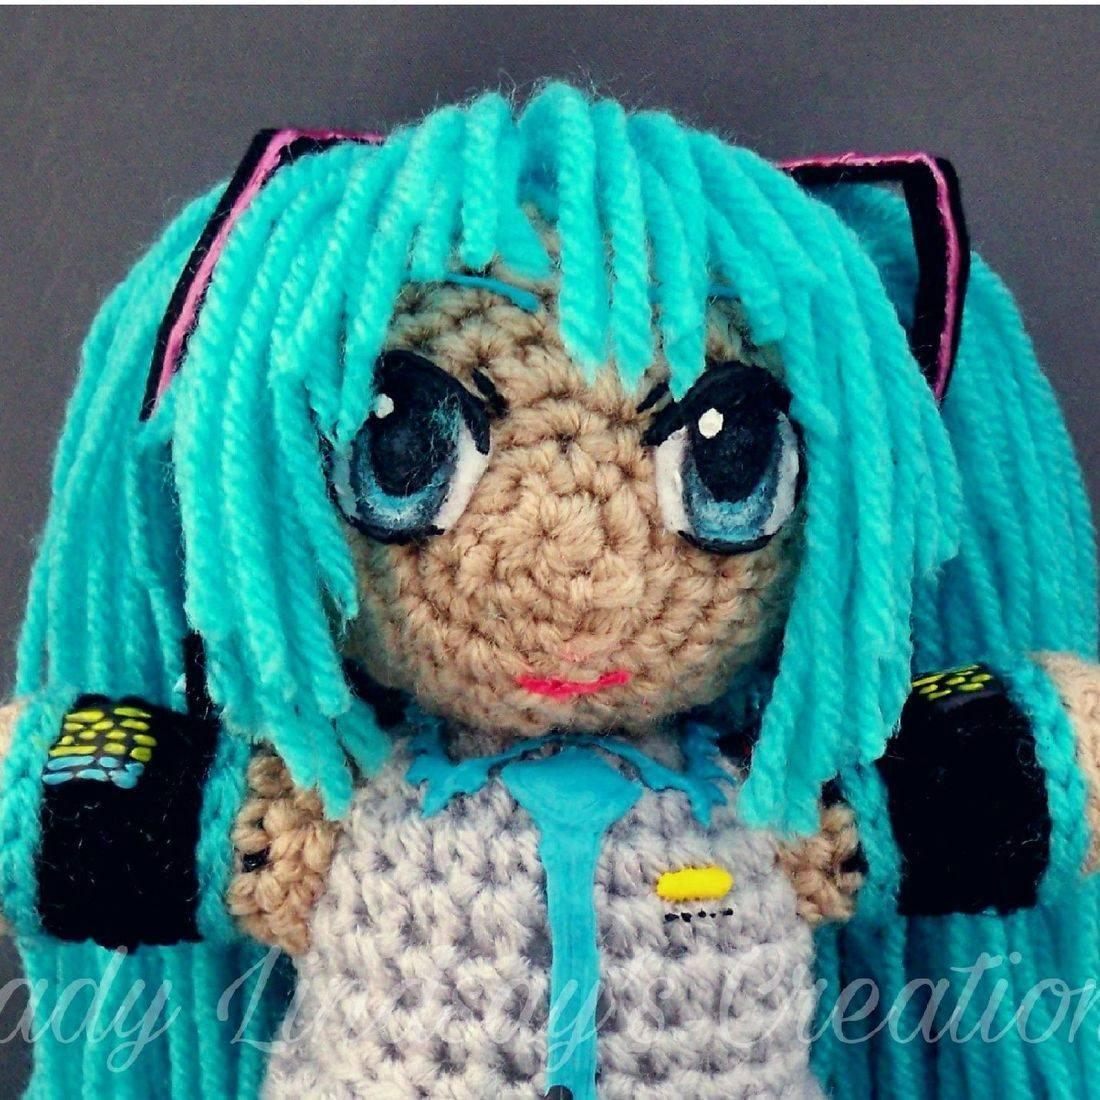 Hatsune Miku, amigurumi, anime, vocaloid, Japan, crochet, handmade, craft, videogames, comicbooks, Lady Lindsay's Creations, Shop Small